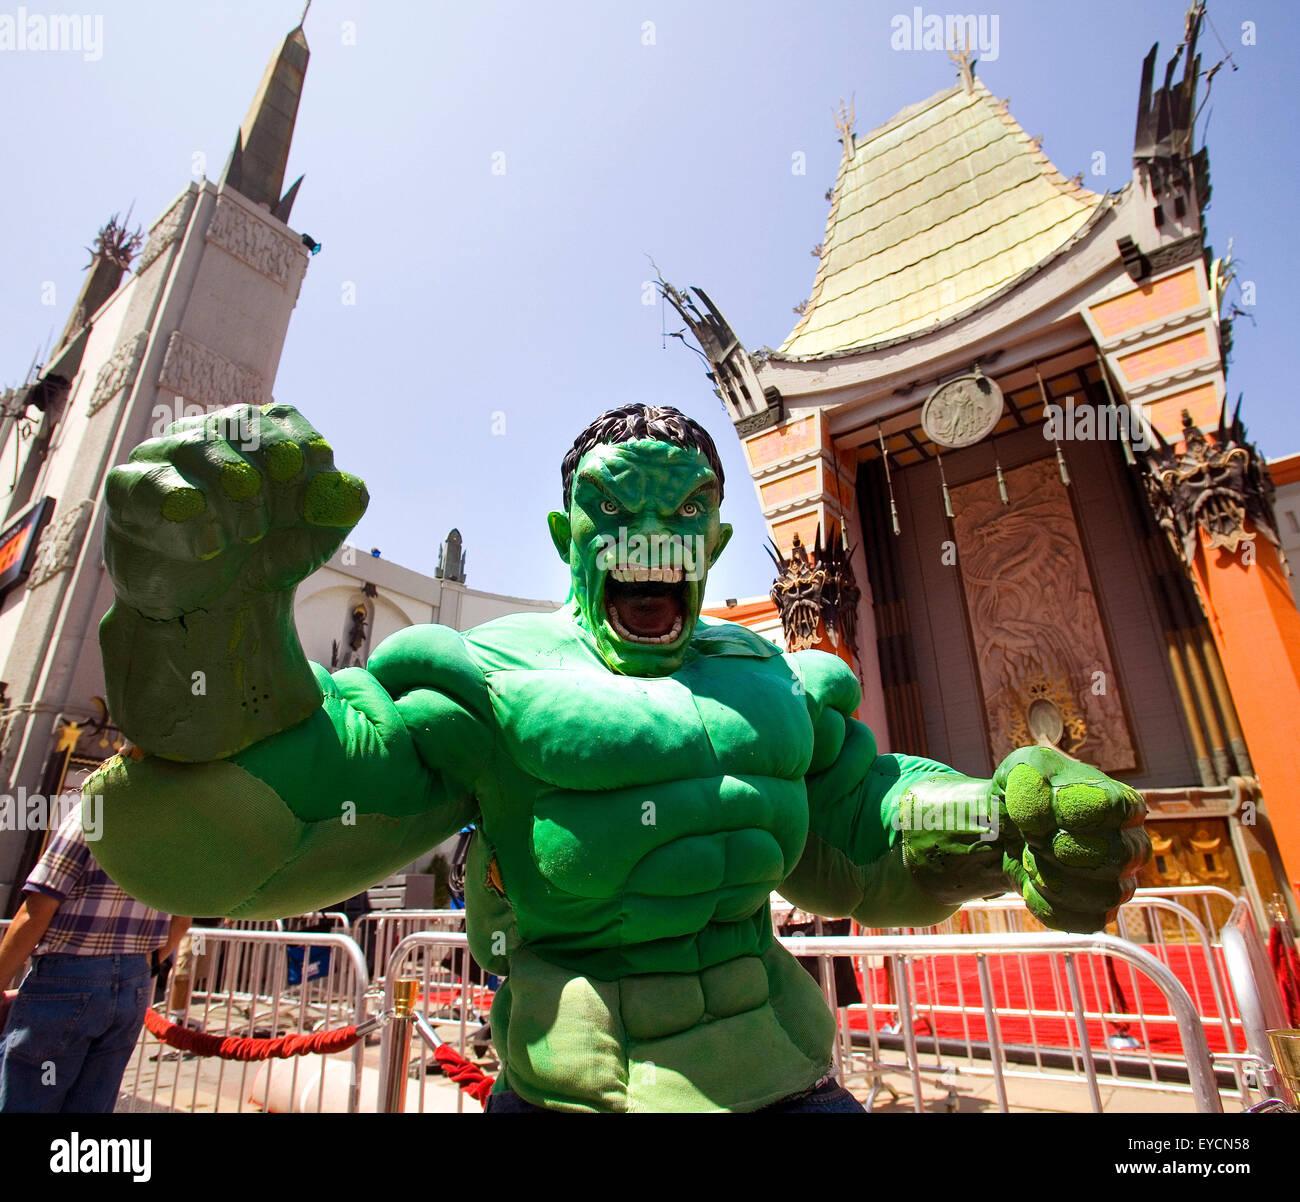 Comicfigur Hulk Stockbild